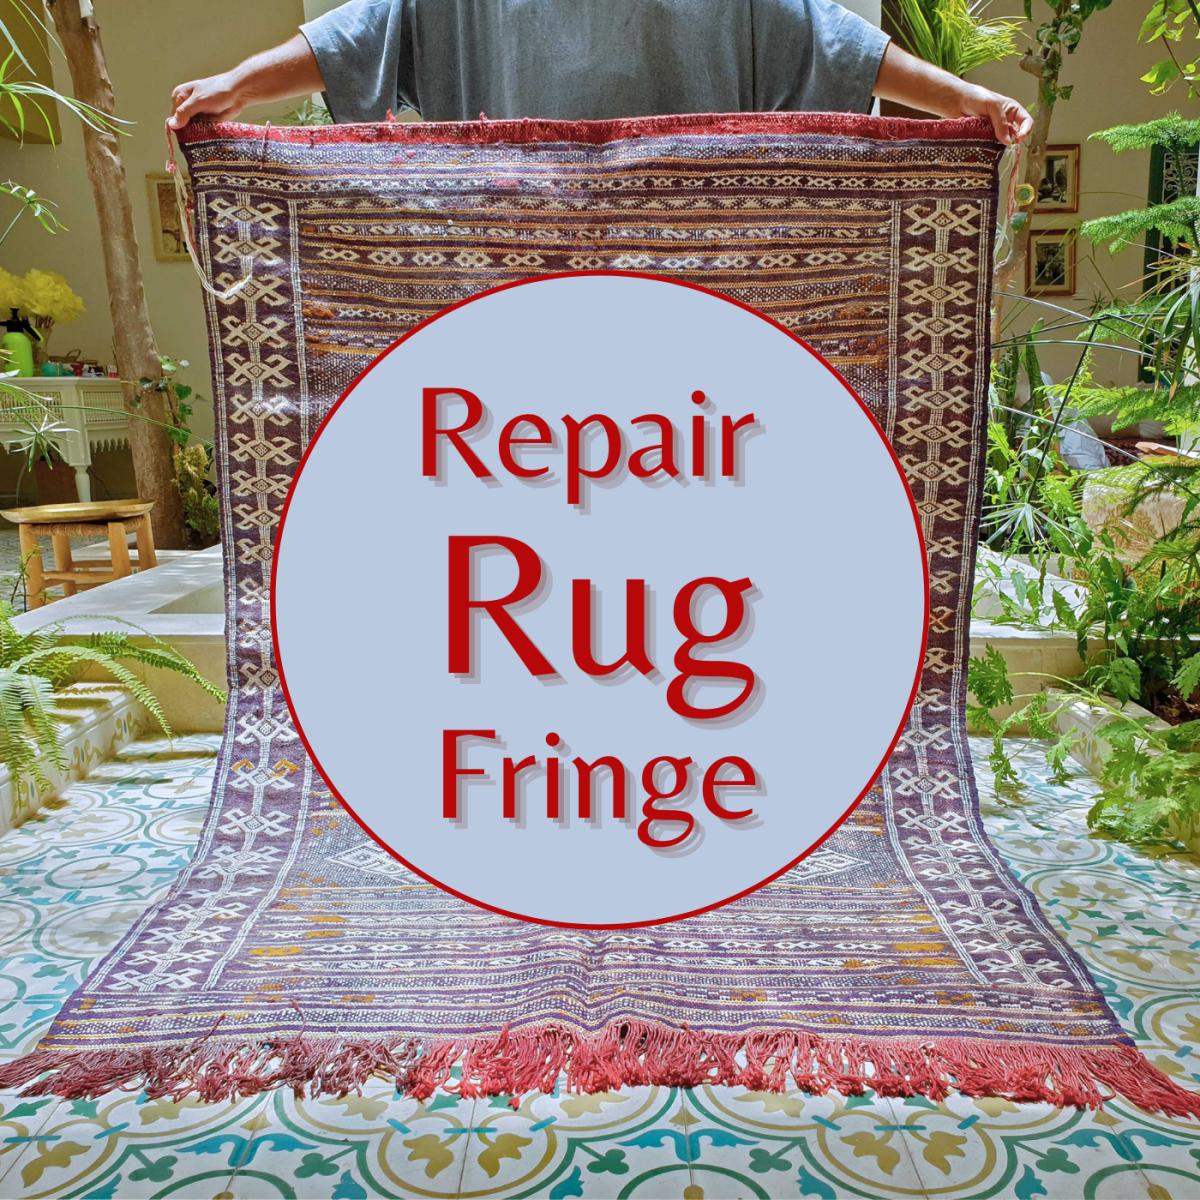 Learn how to repair rug fringe.